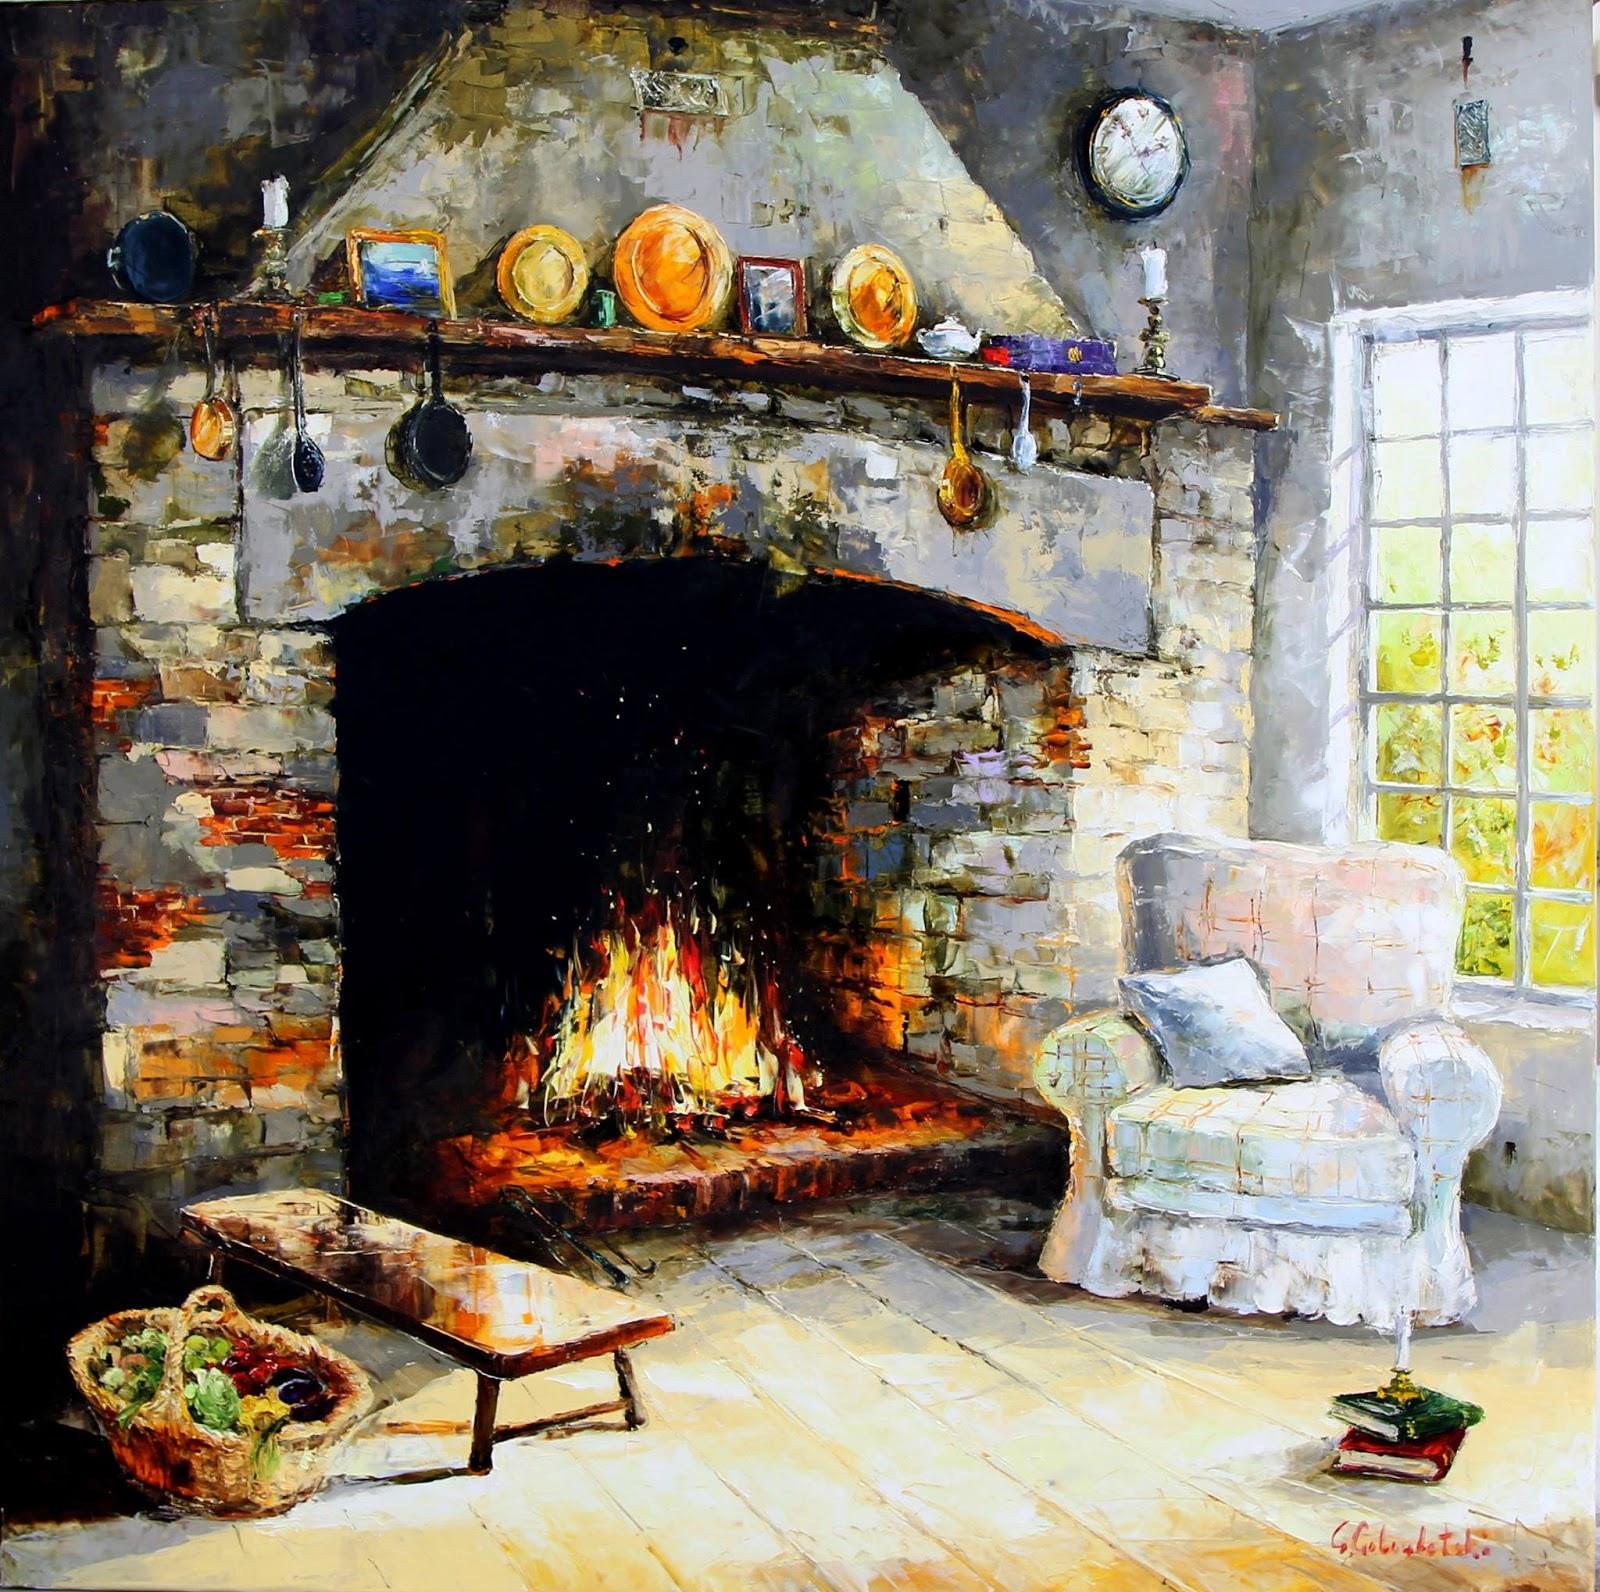 Gleb Goloubetski Fireplace in country house